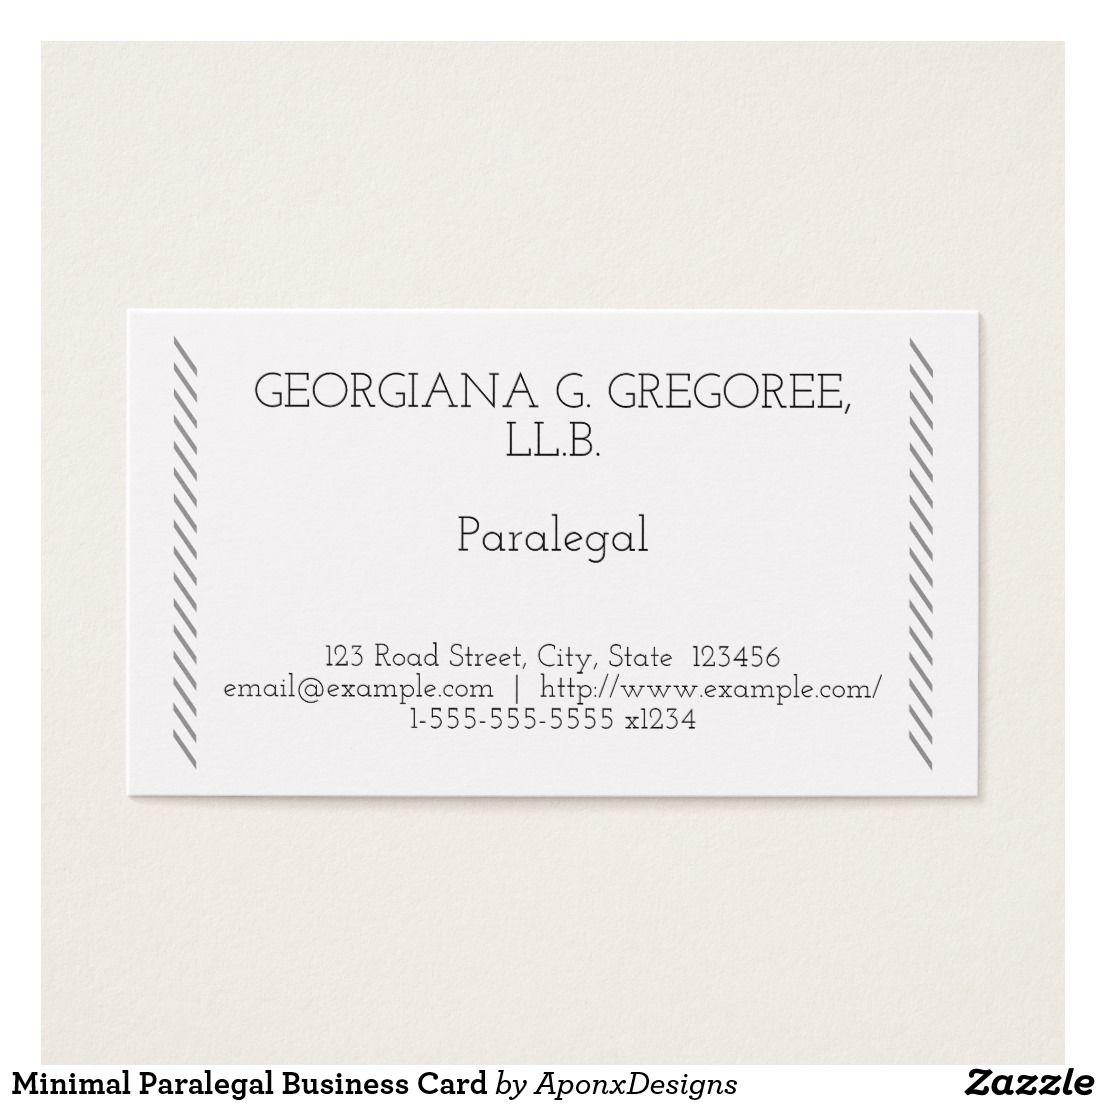 Minimal Paralegal Business Card | Customizable Business Card Designs ...